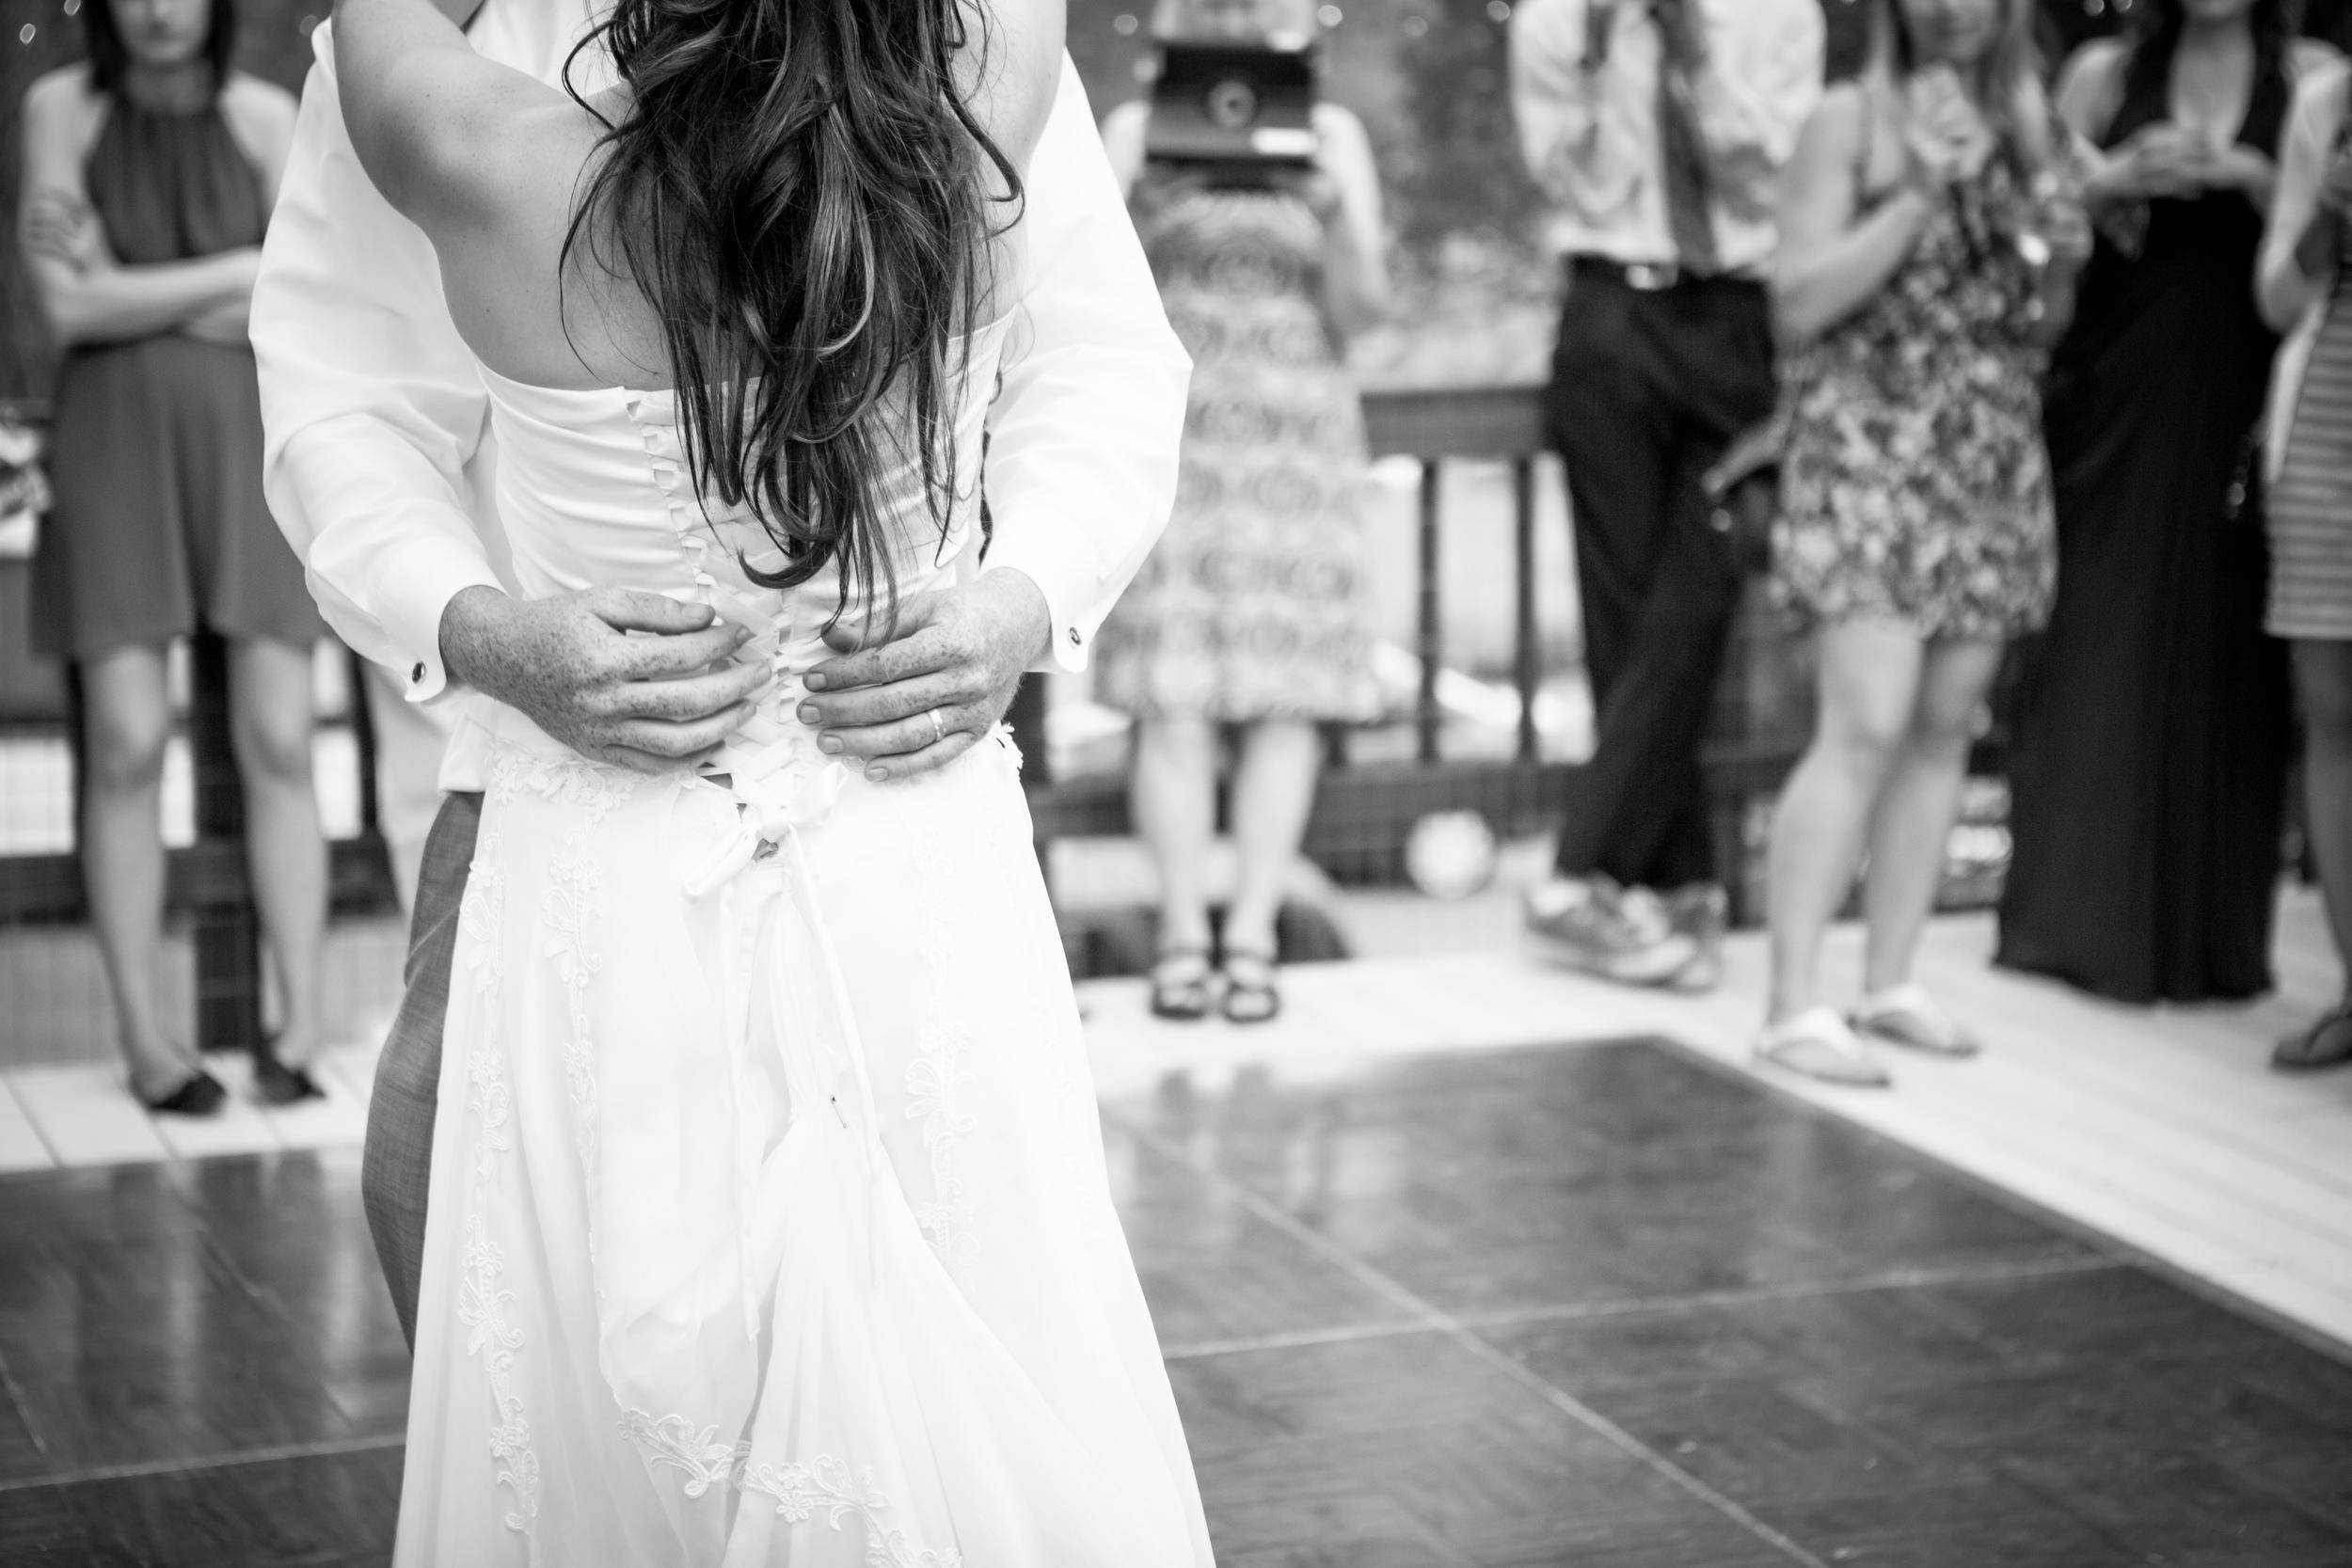 Merhaut_Wedding_2014_555-2.jpg